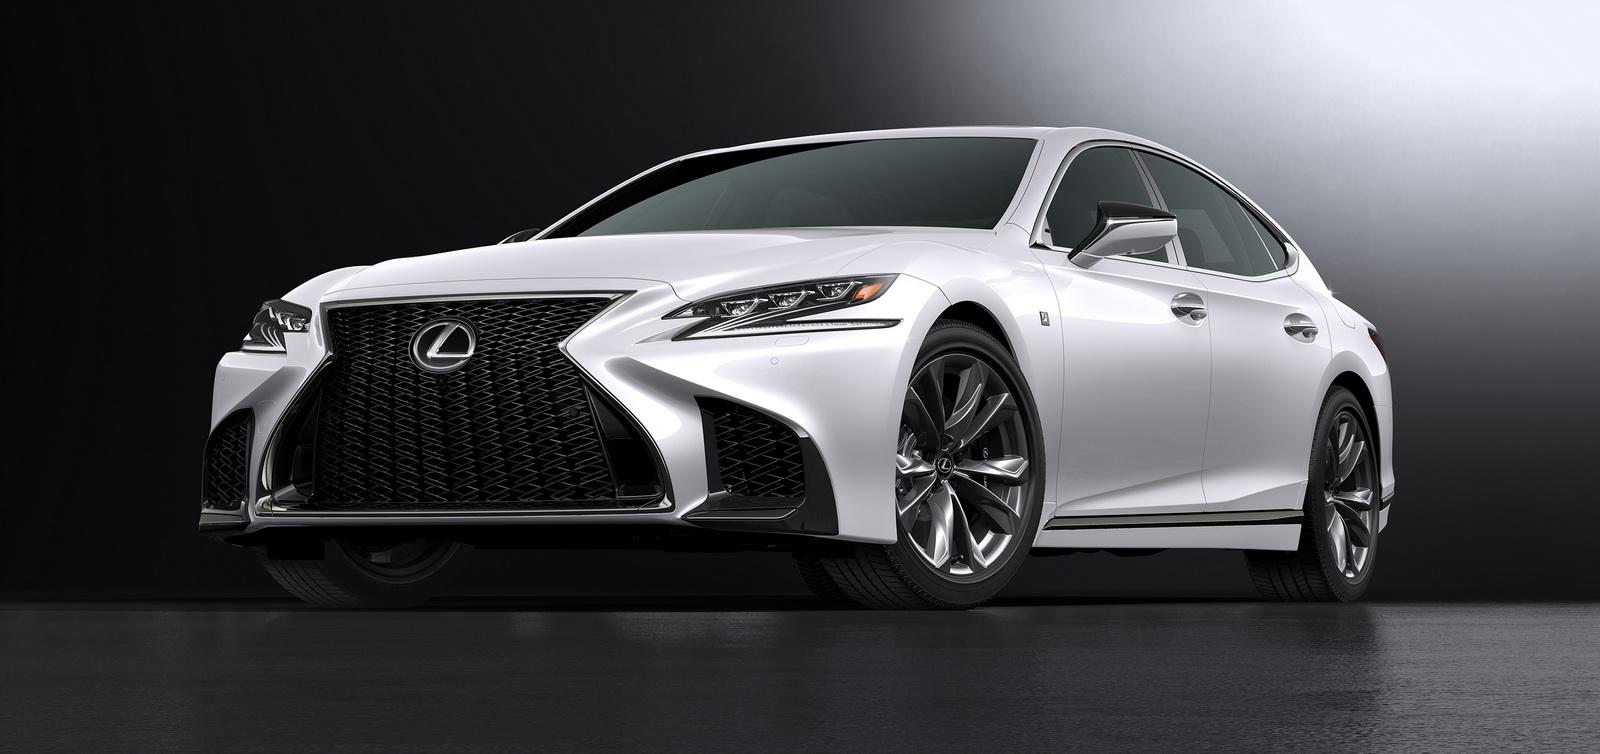 Lexus Reveals New 2018 LS 500 F Sport, Says It's The Most ...